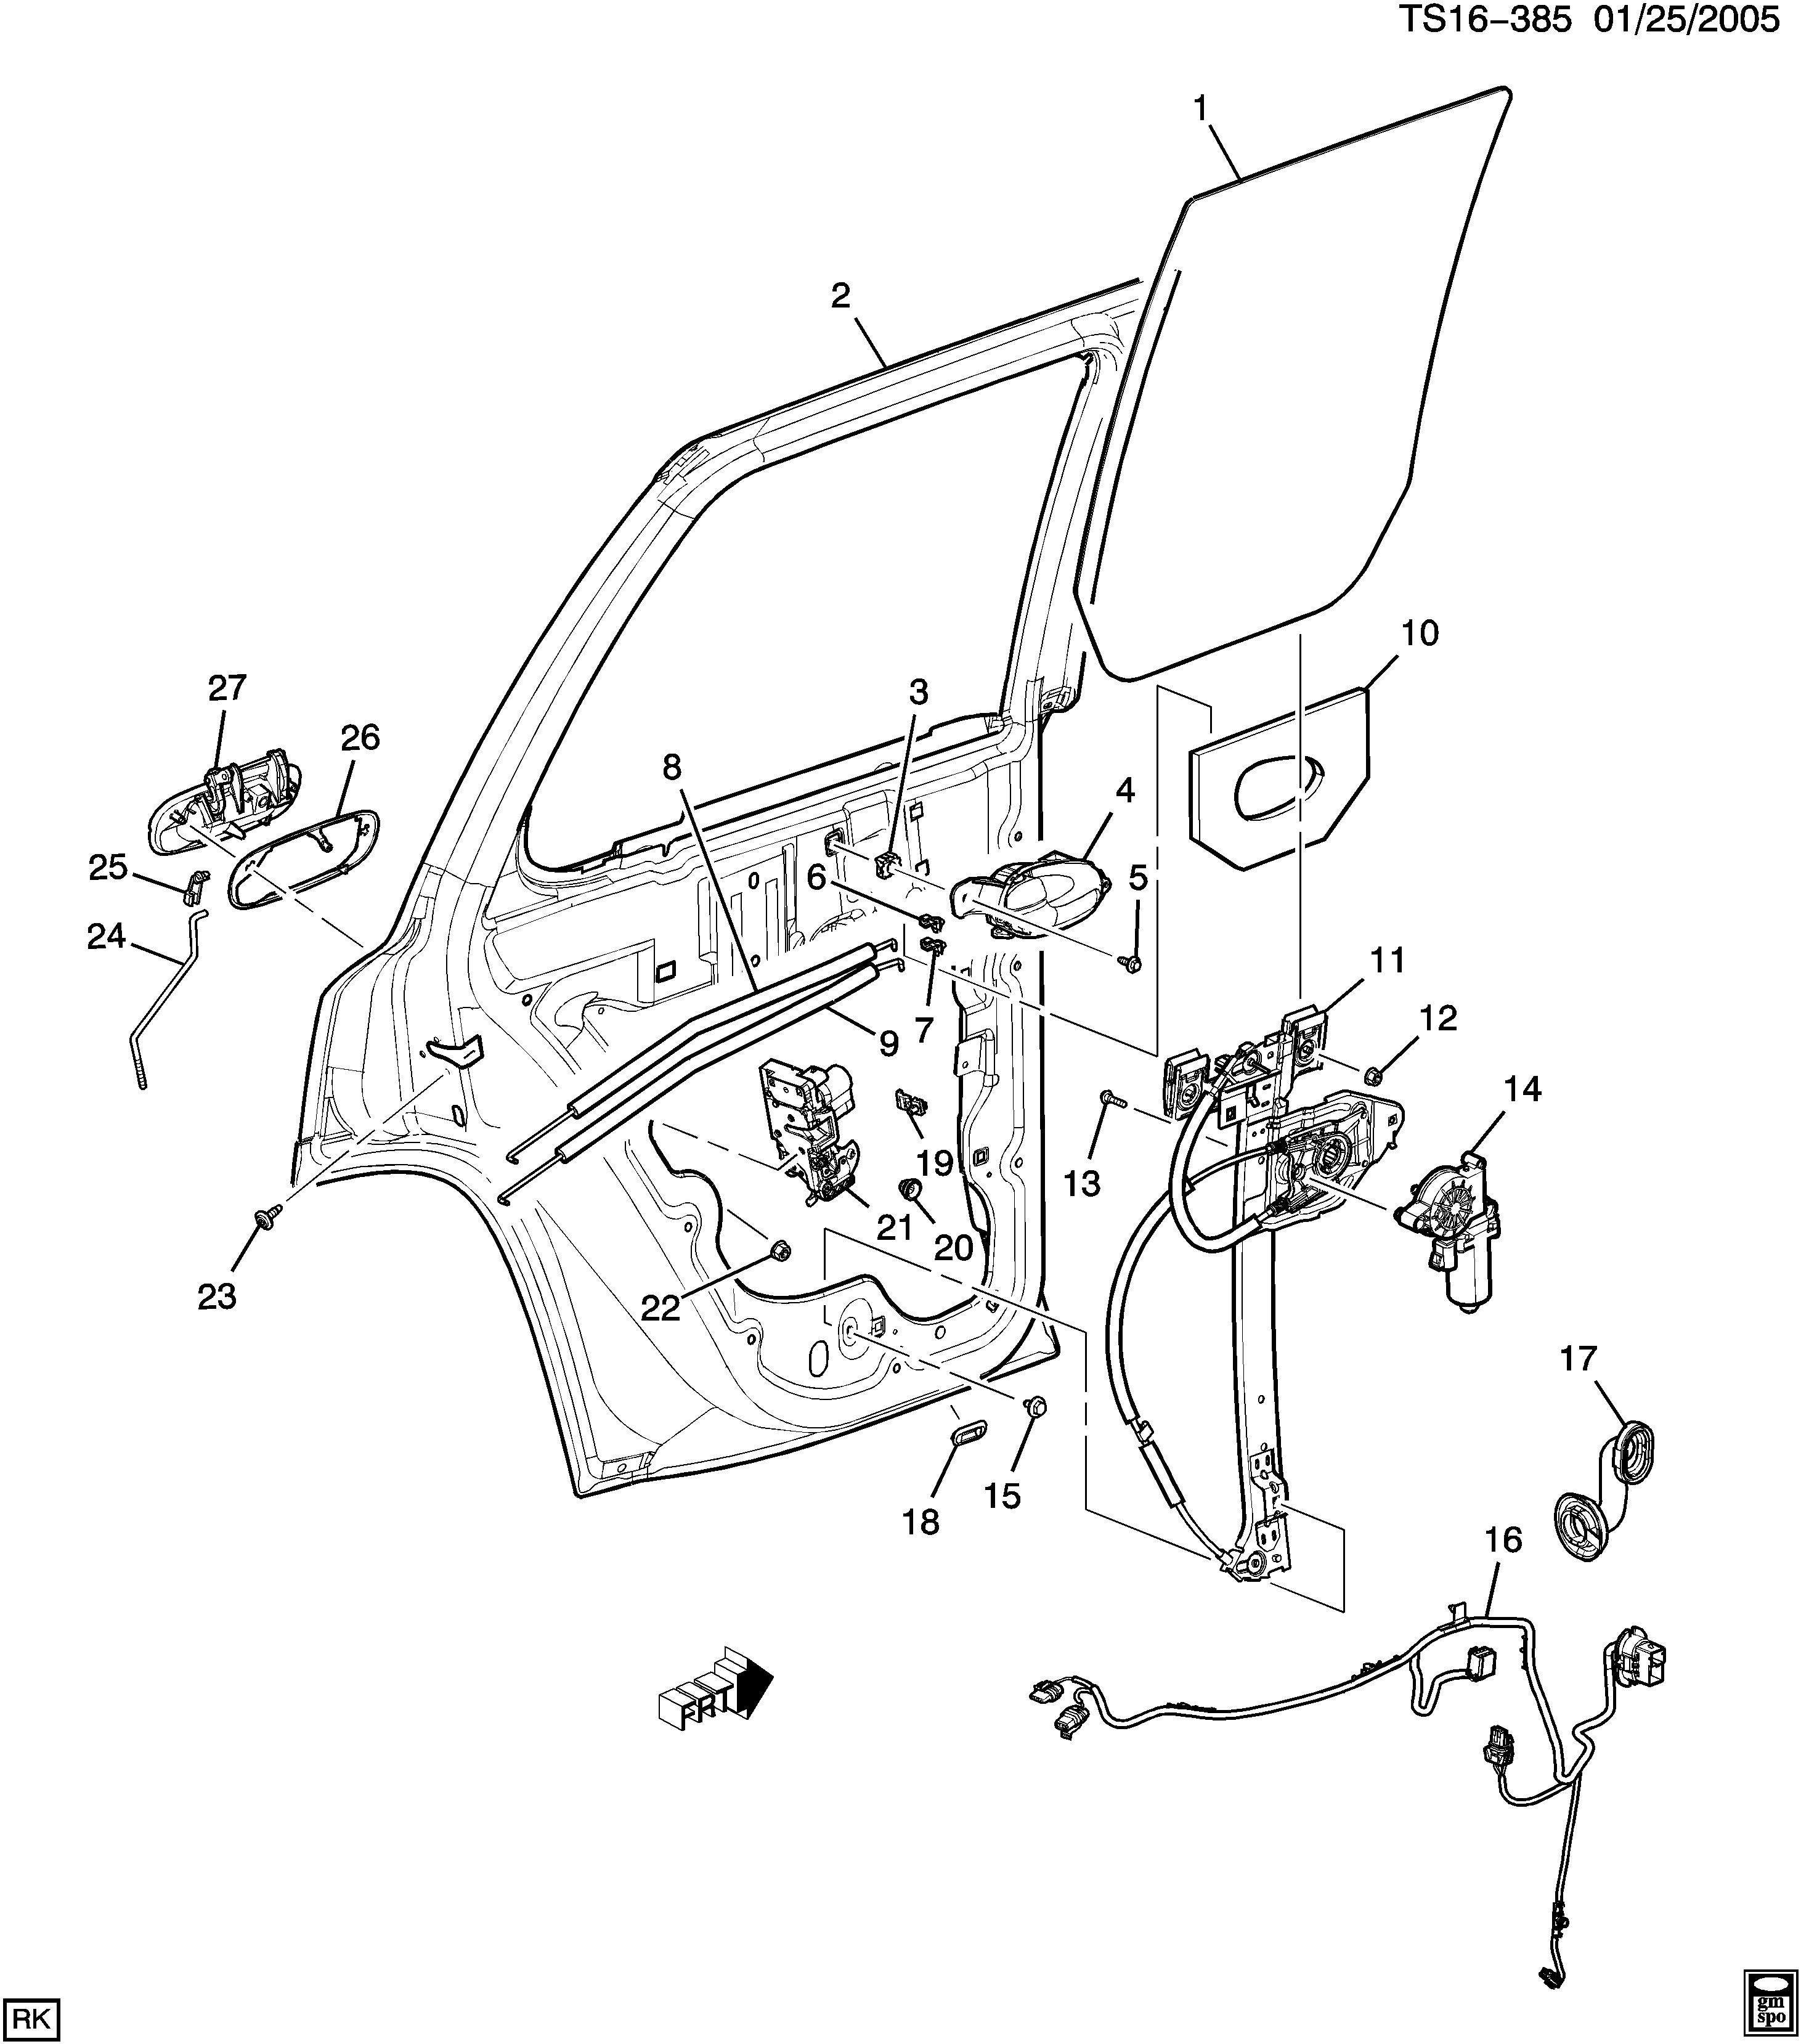 saab 9 7x t1 door hardware side rear part 2 epc online nemiga Saab 9- 5 t1 door hardware side rear part 2